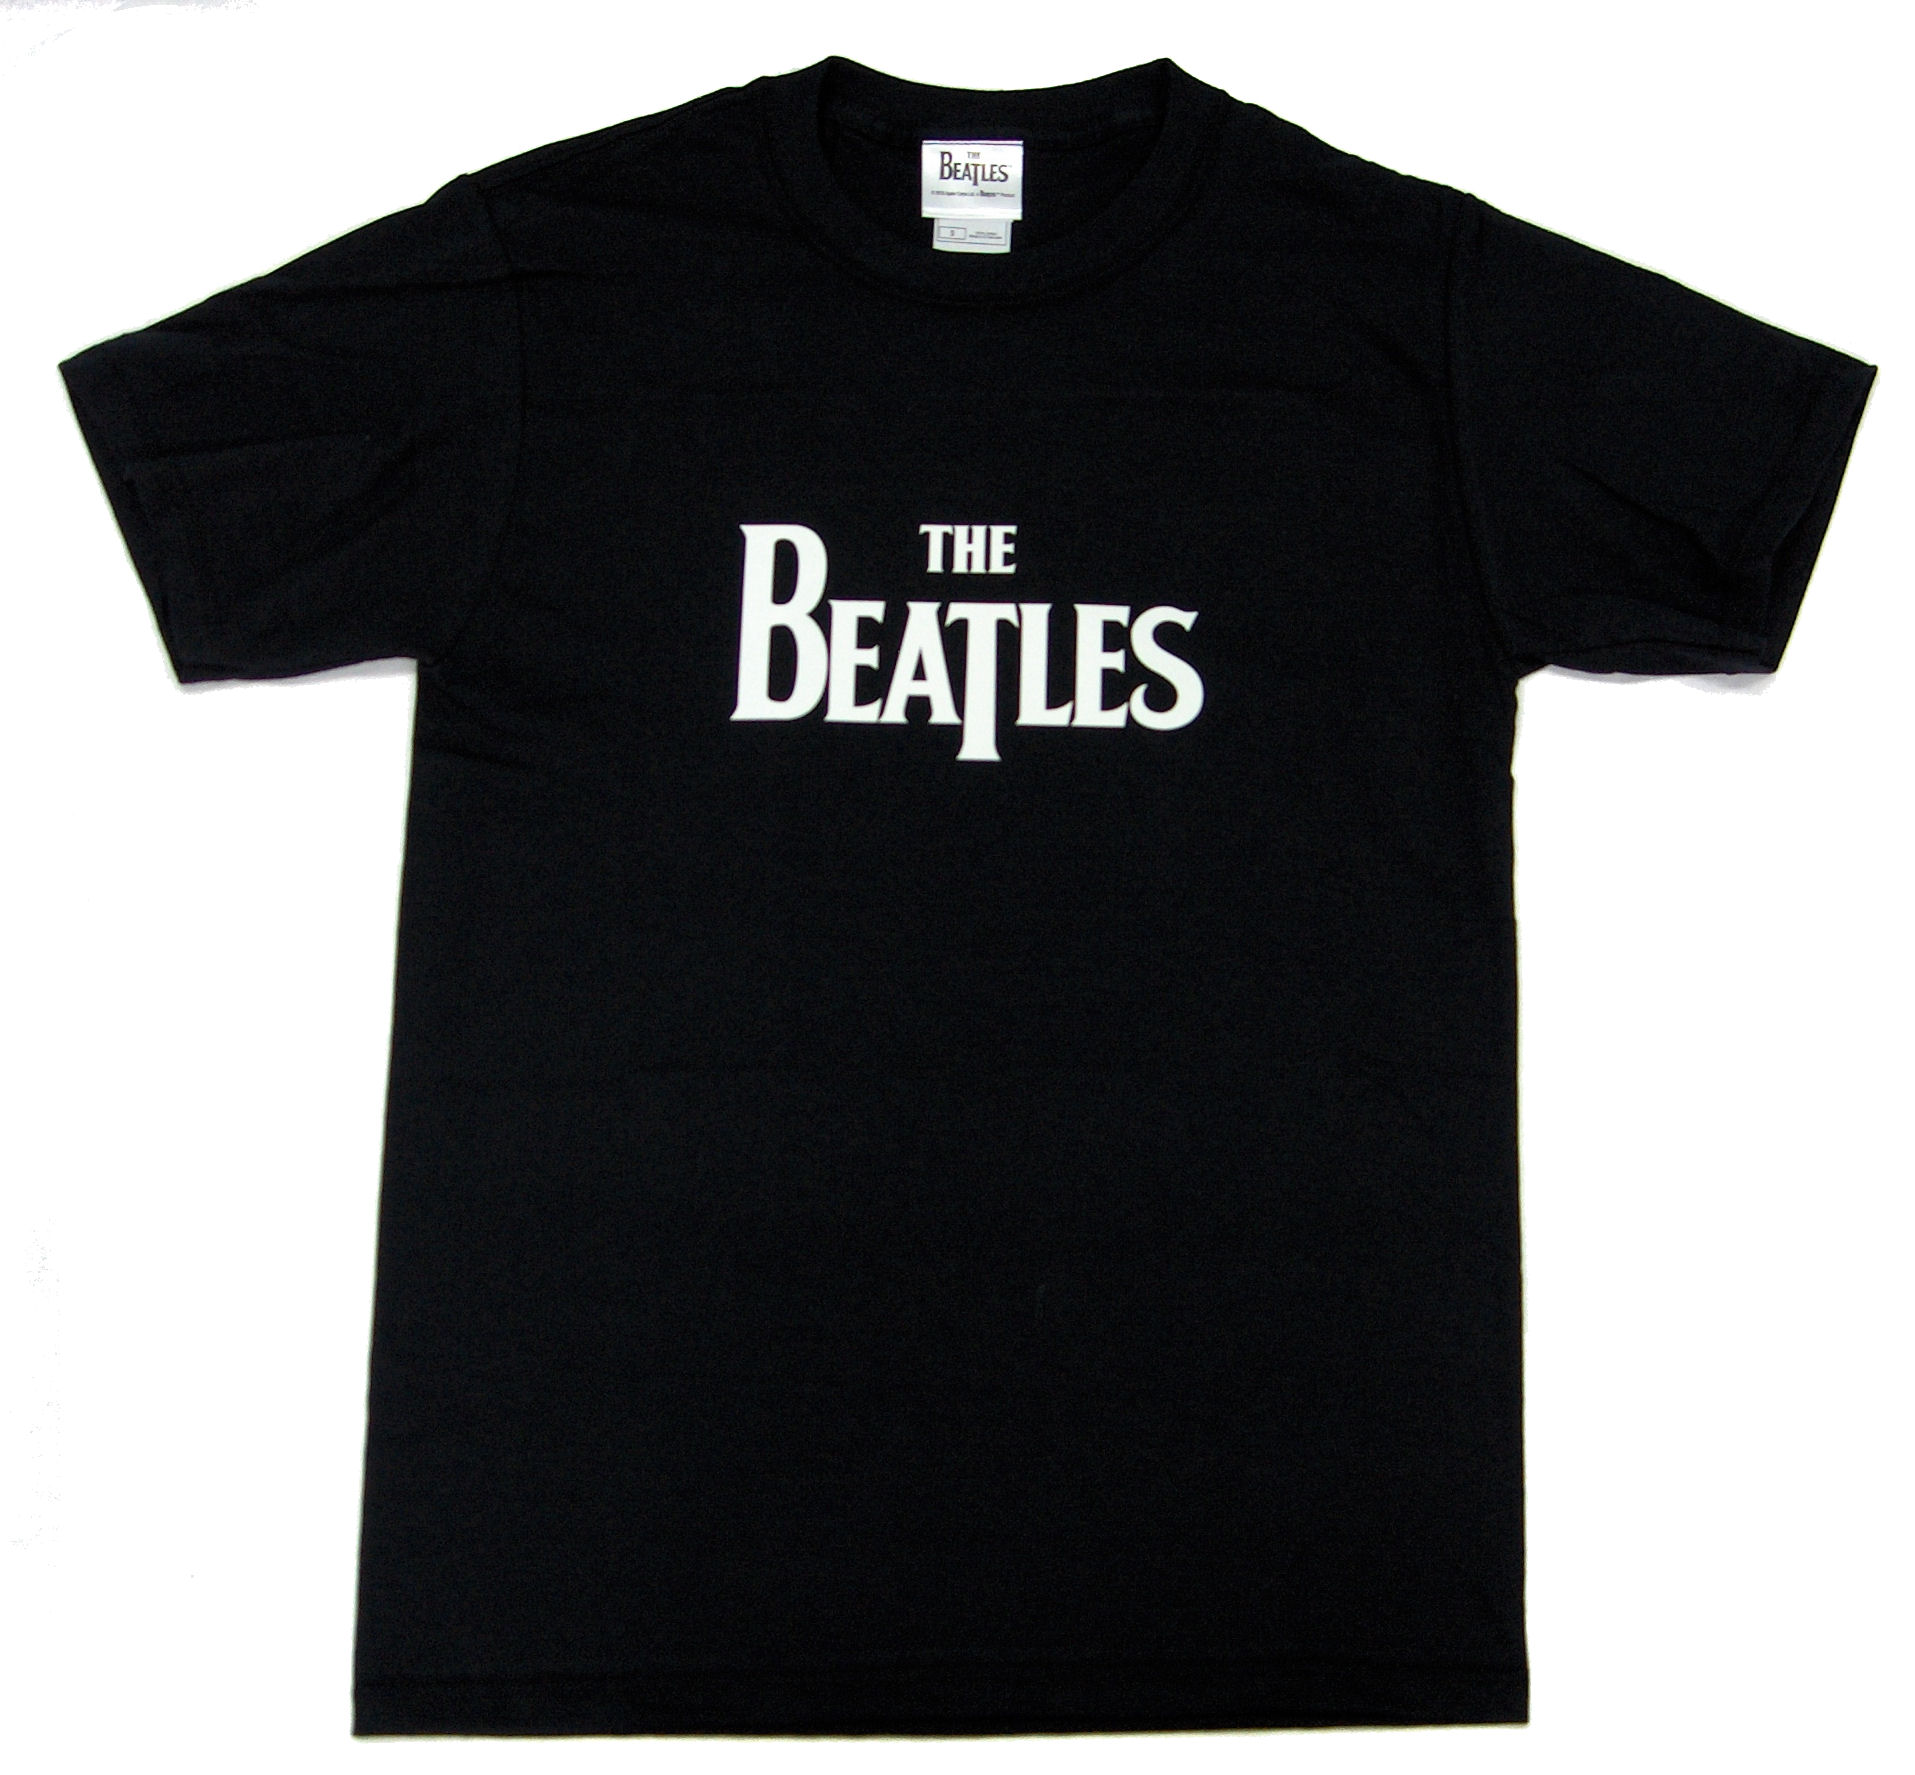 4d76c7ae4 the Beatles Band T-shirt - Basic tees shop